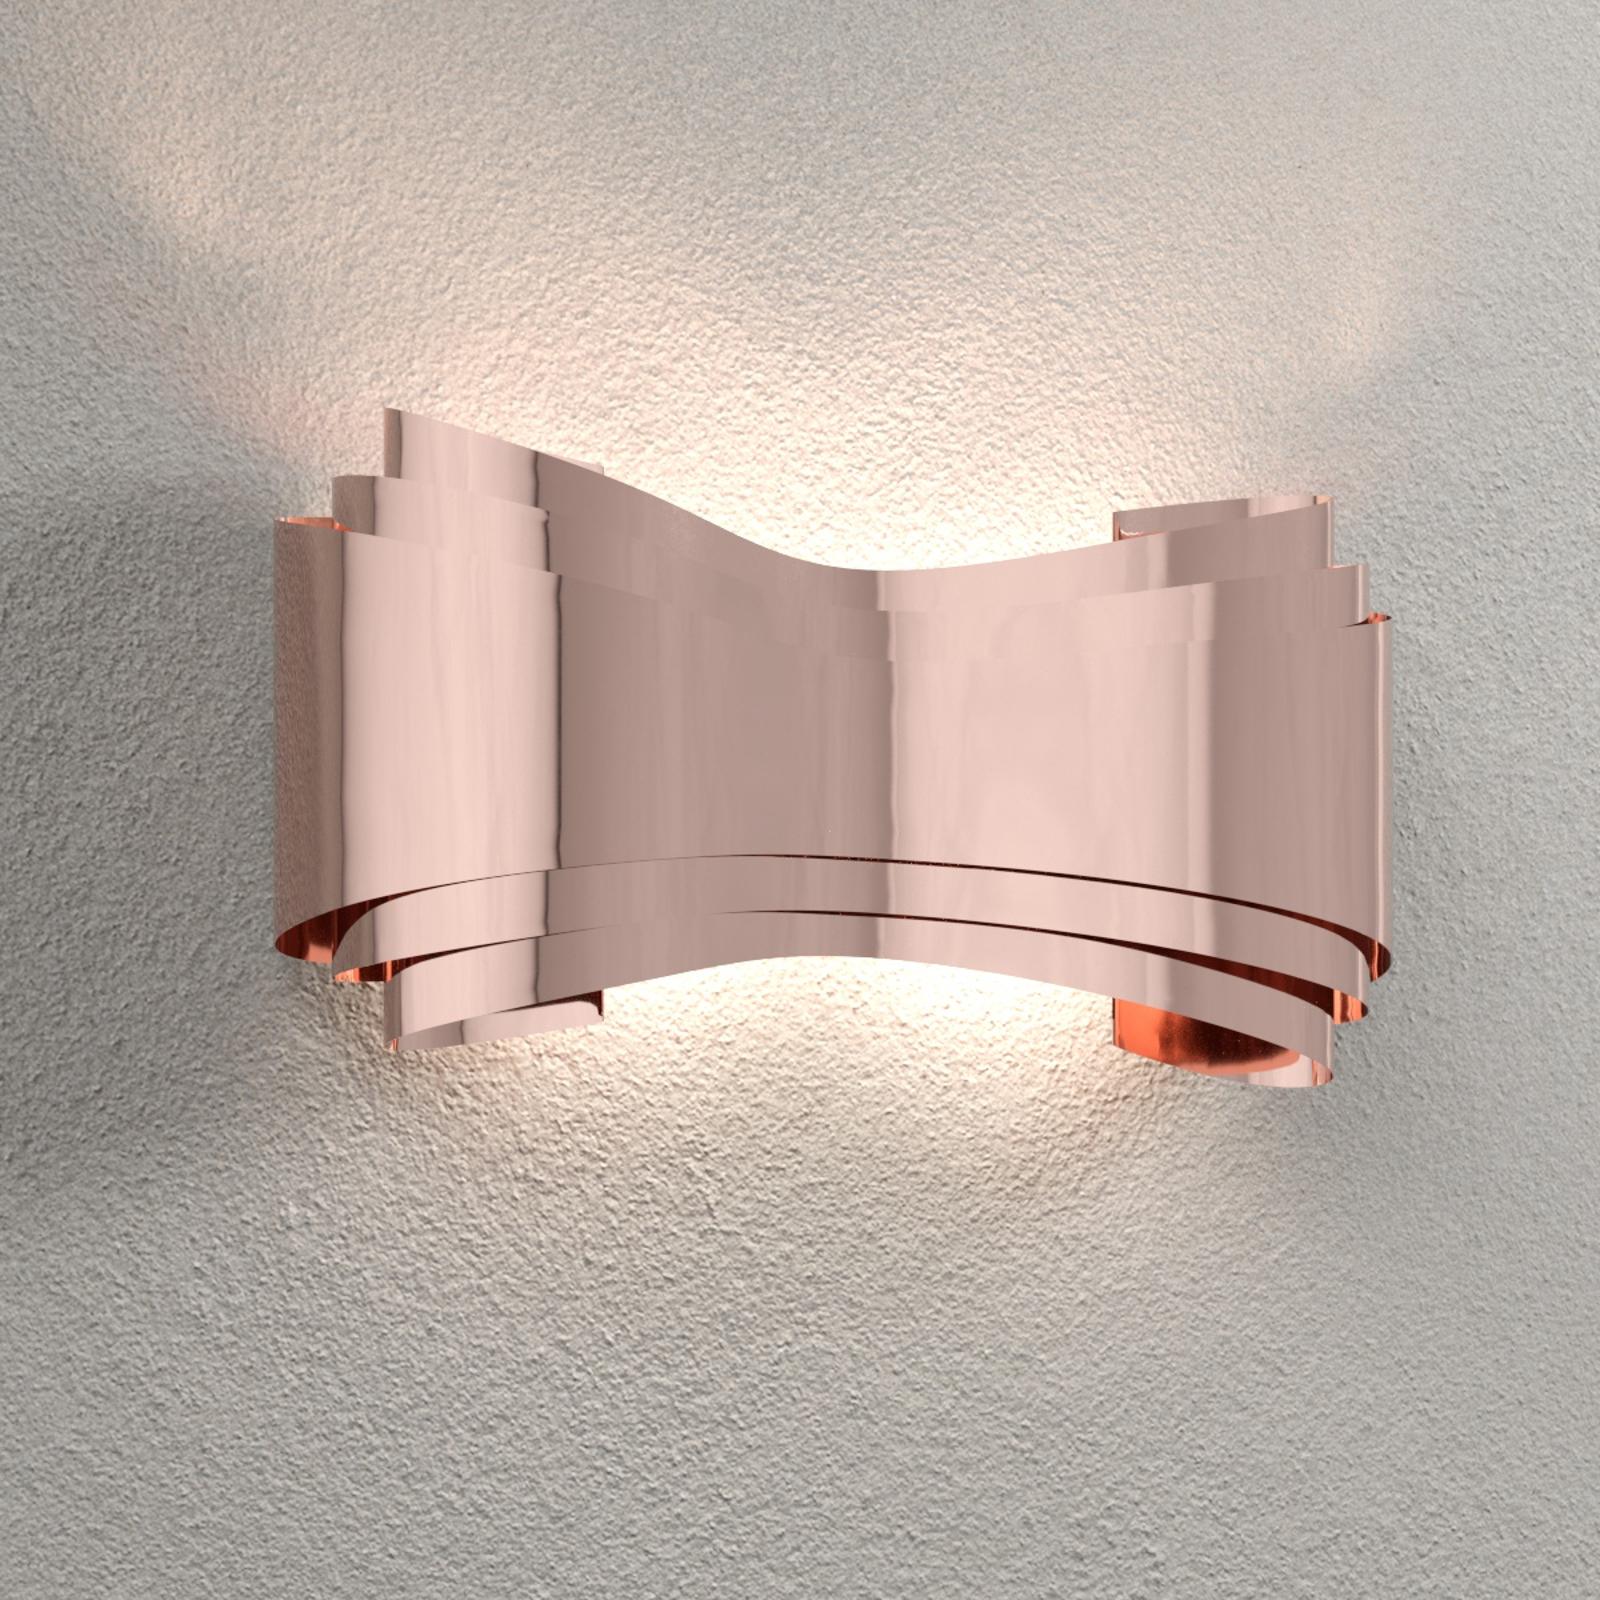 Ionica - kupferfarbene LED-Designer-Wandleuchte